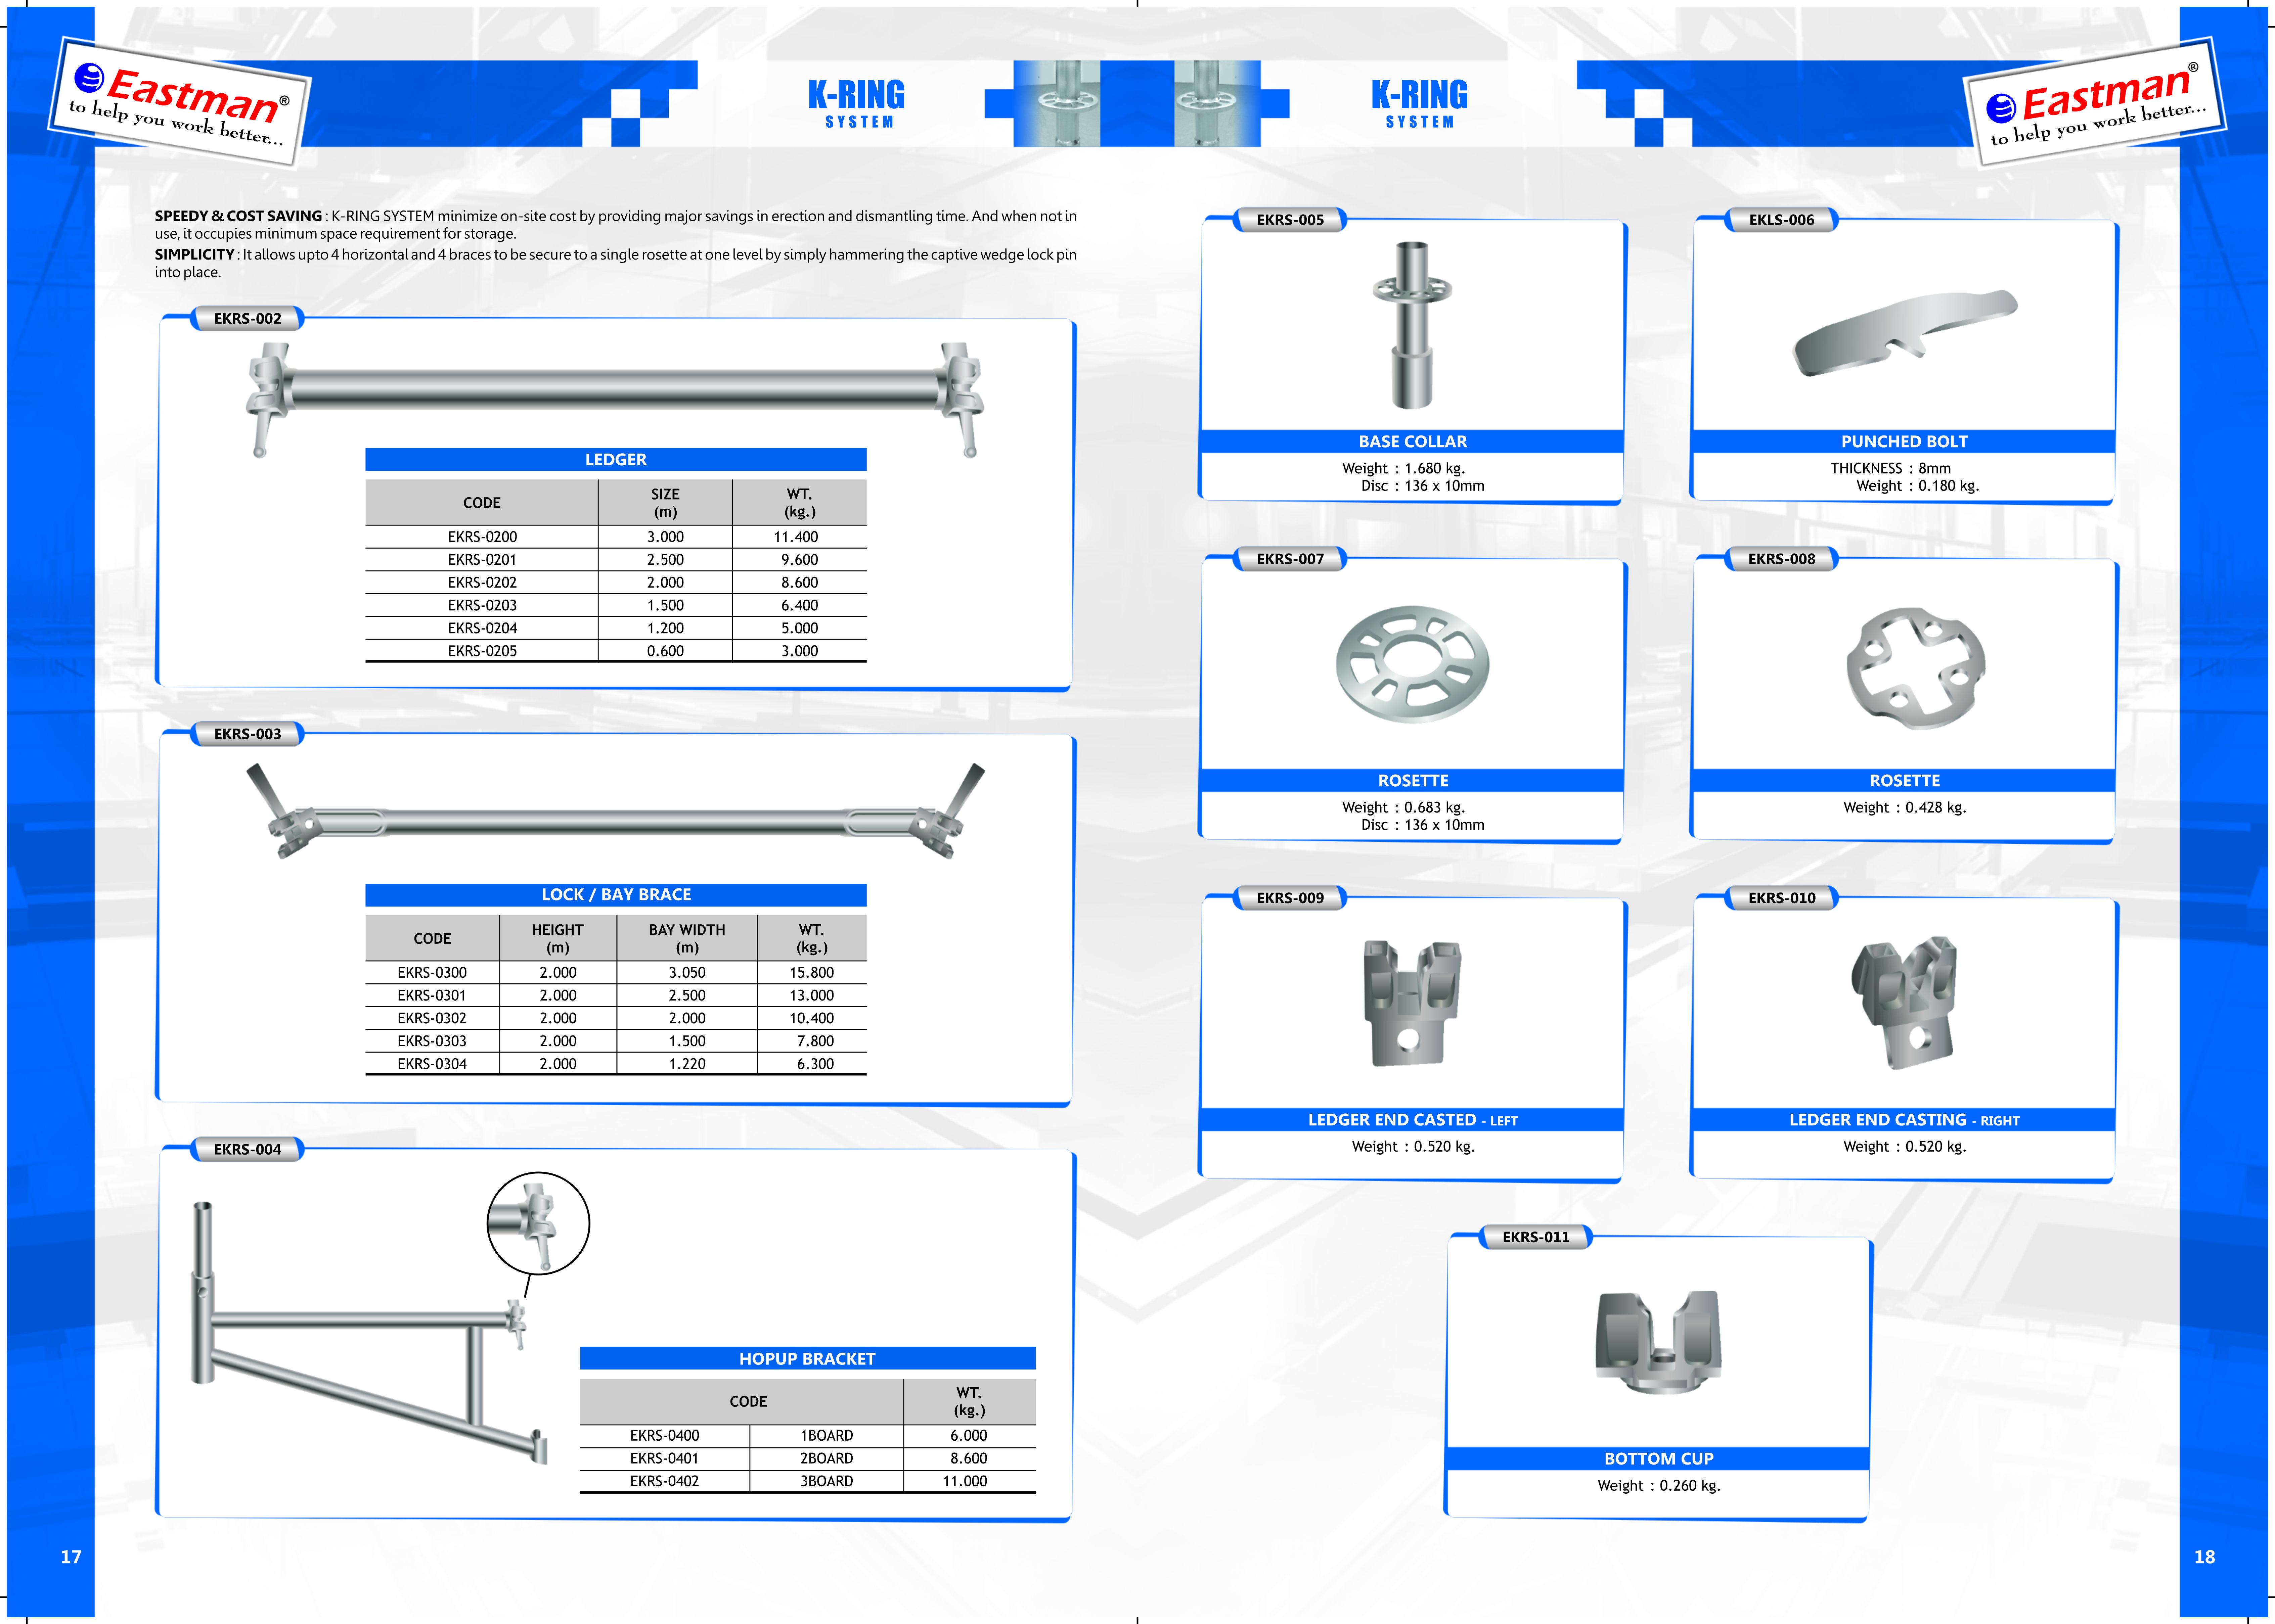 Scaffolding image by EastmanhandtoolsIndia Hand tools